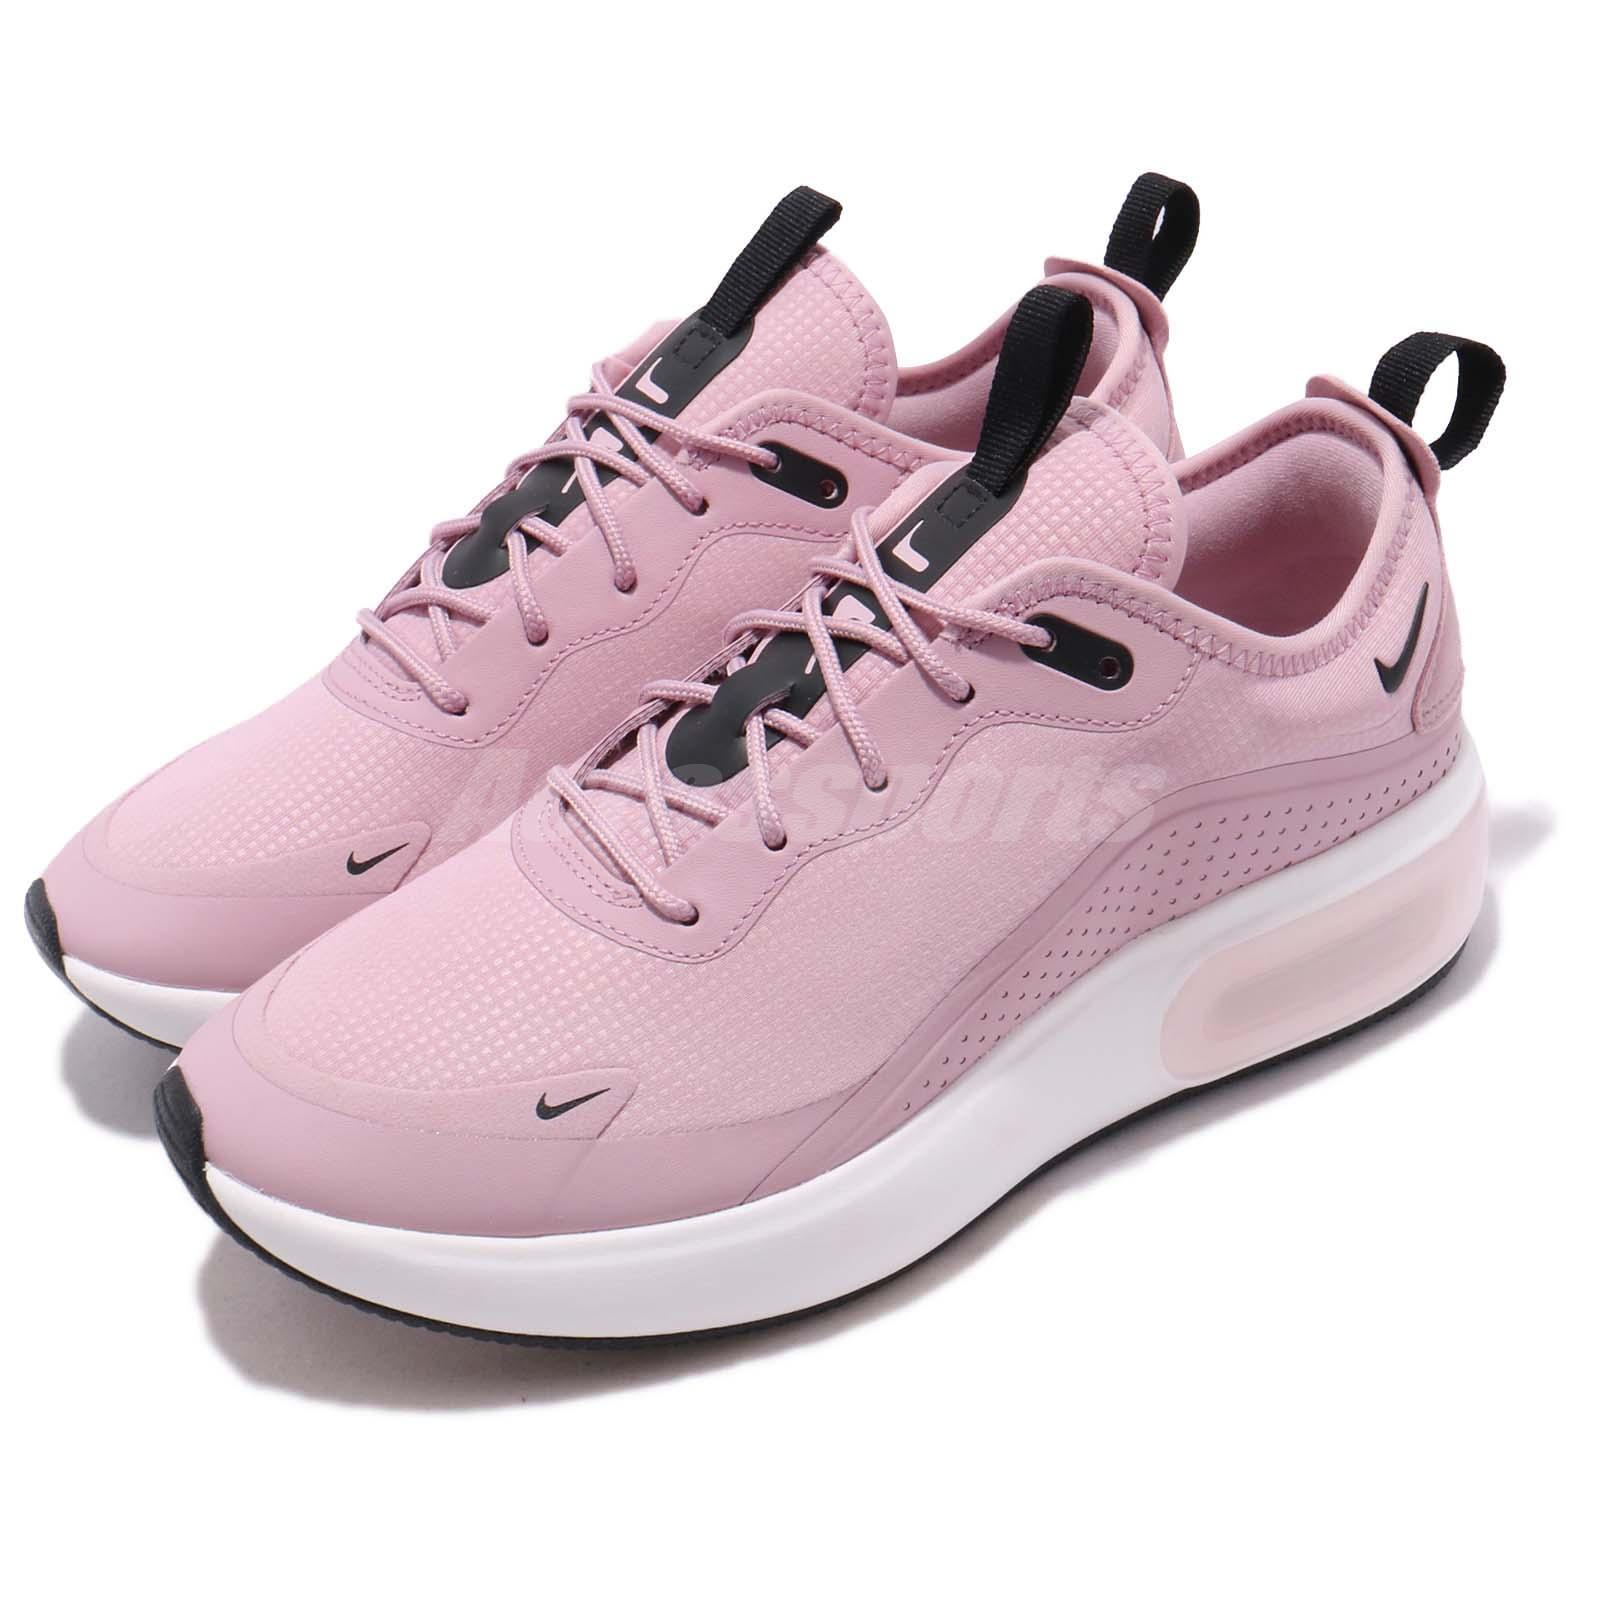 586763417c1 Details about Nike Wmns Air Max DIA Plum Chalk Black White Women Running  Shoes AQ4312-500